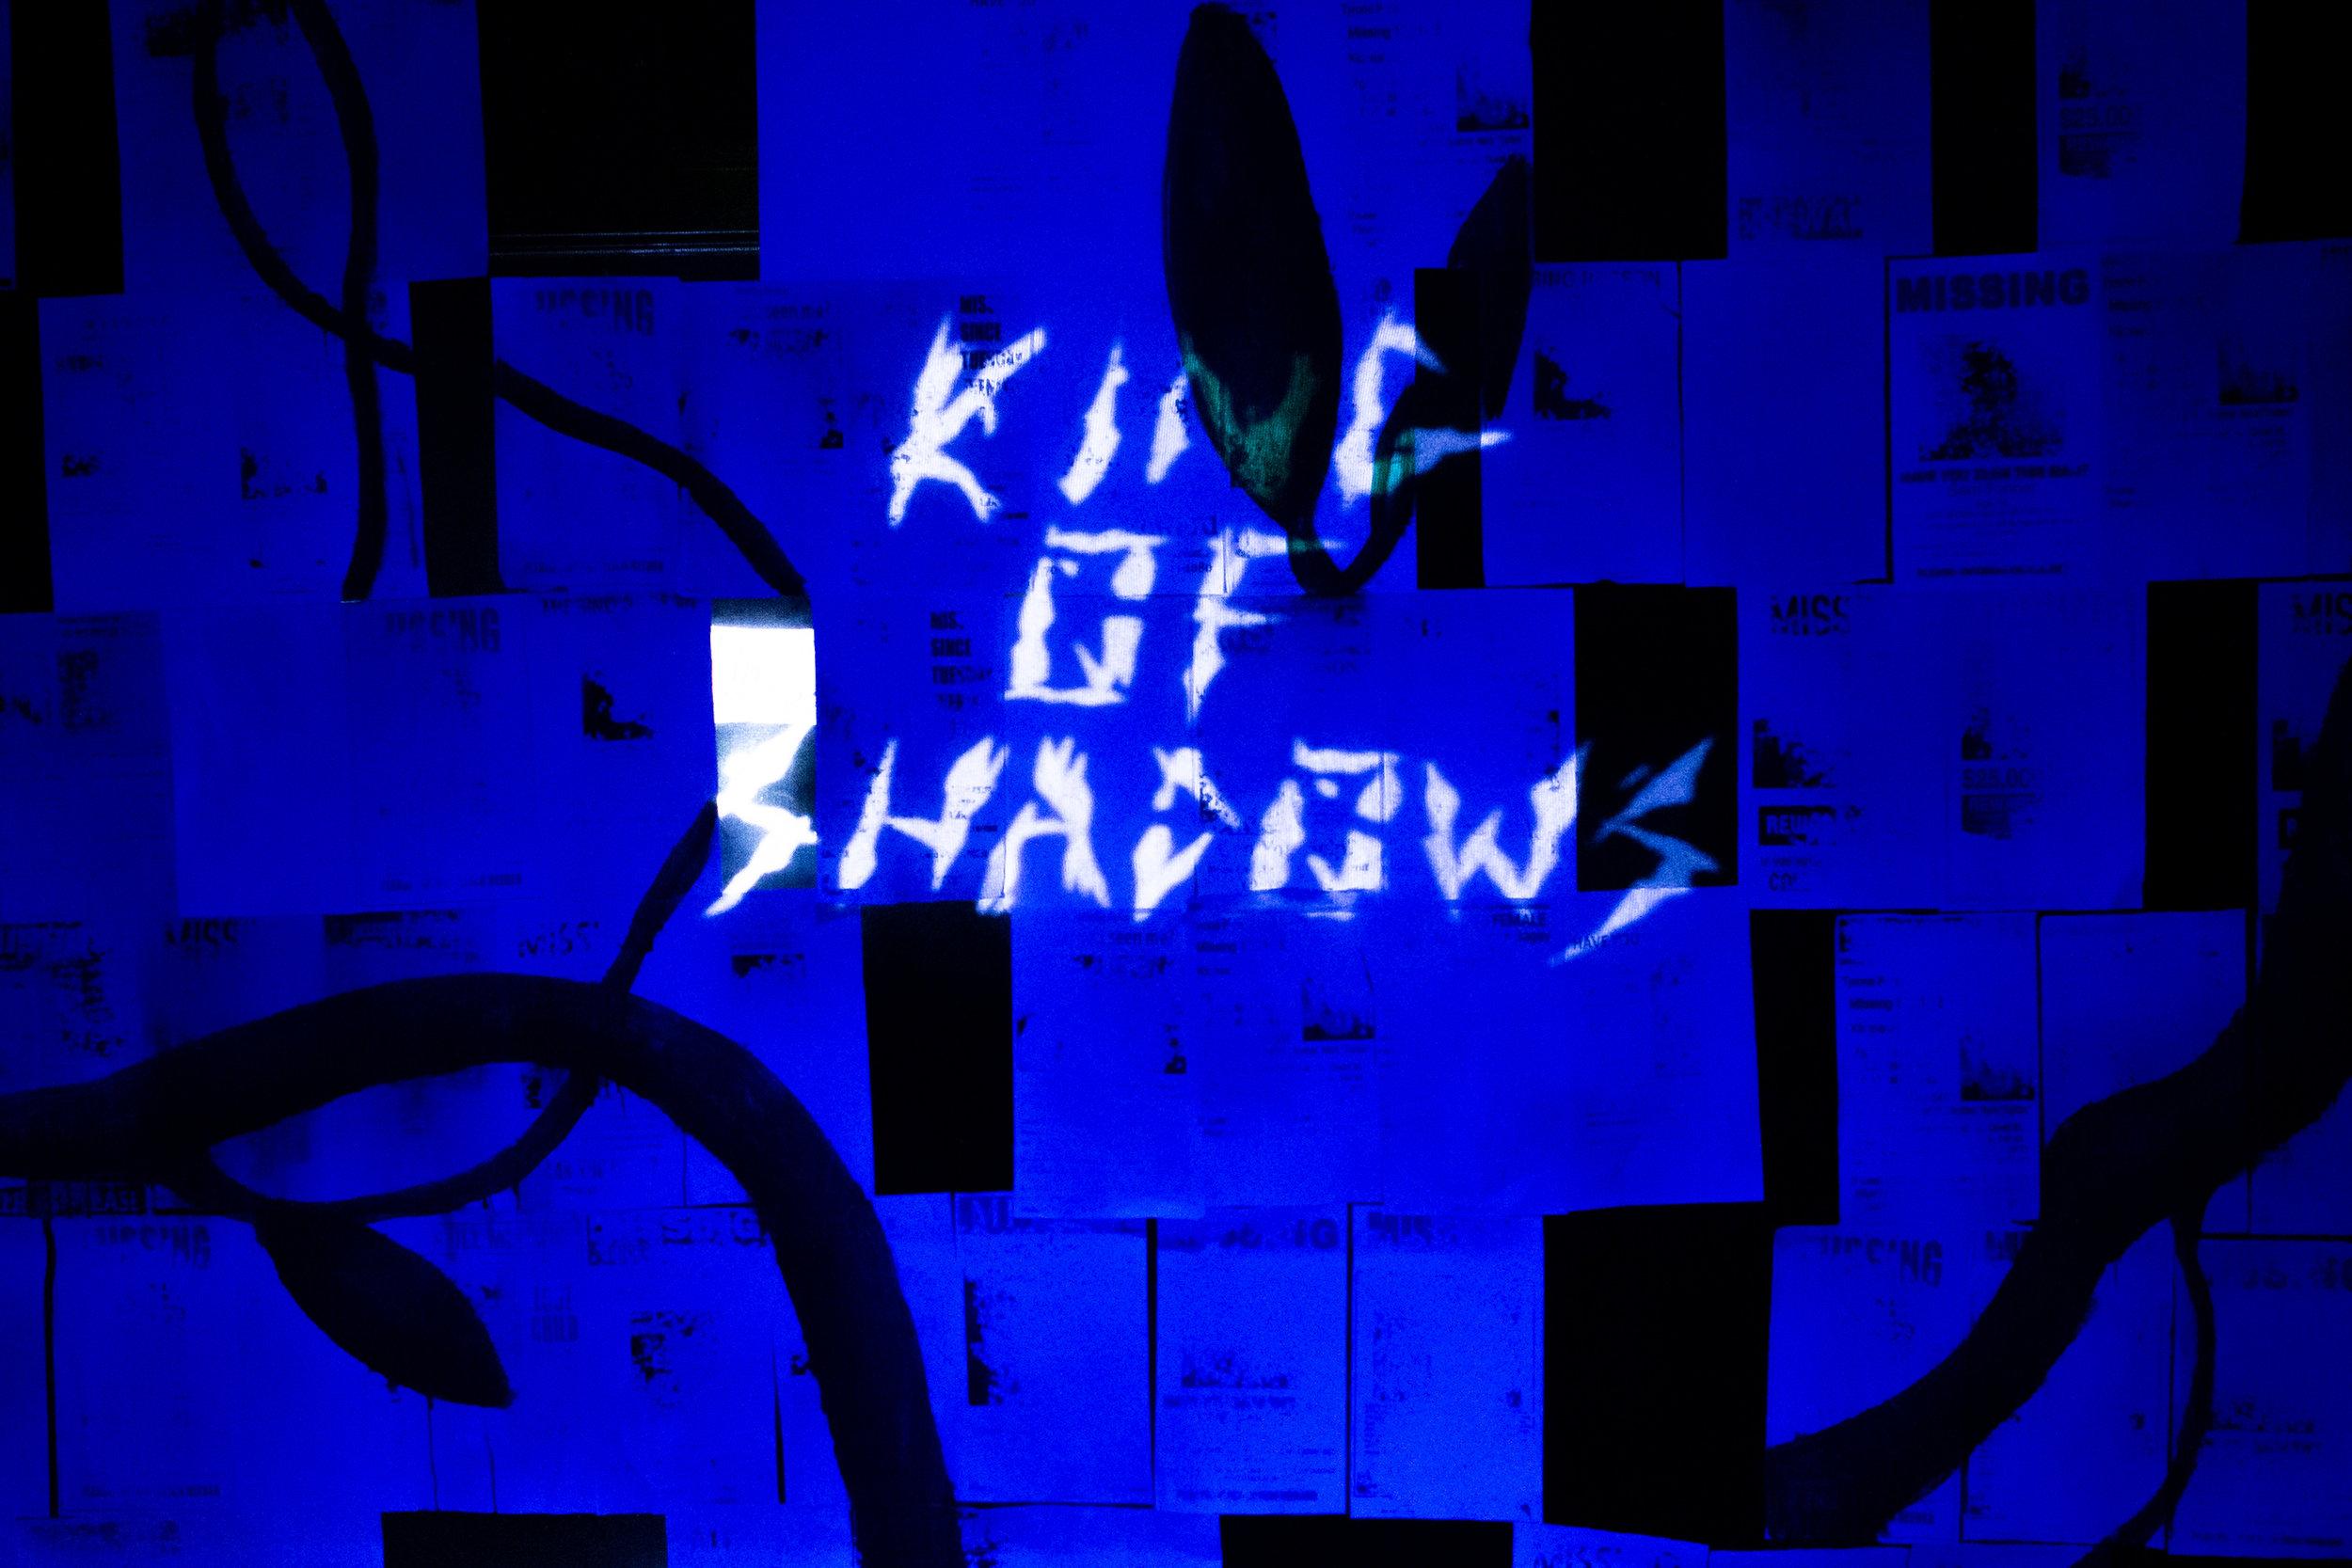 King of Shadows (2019)